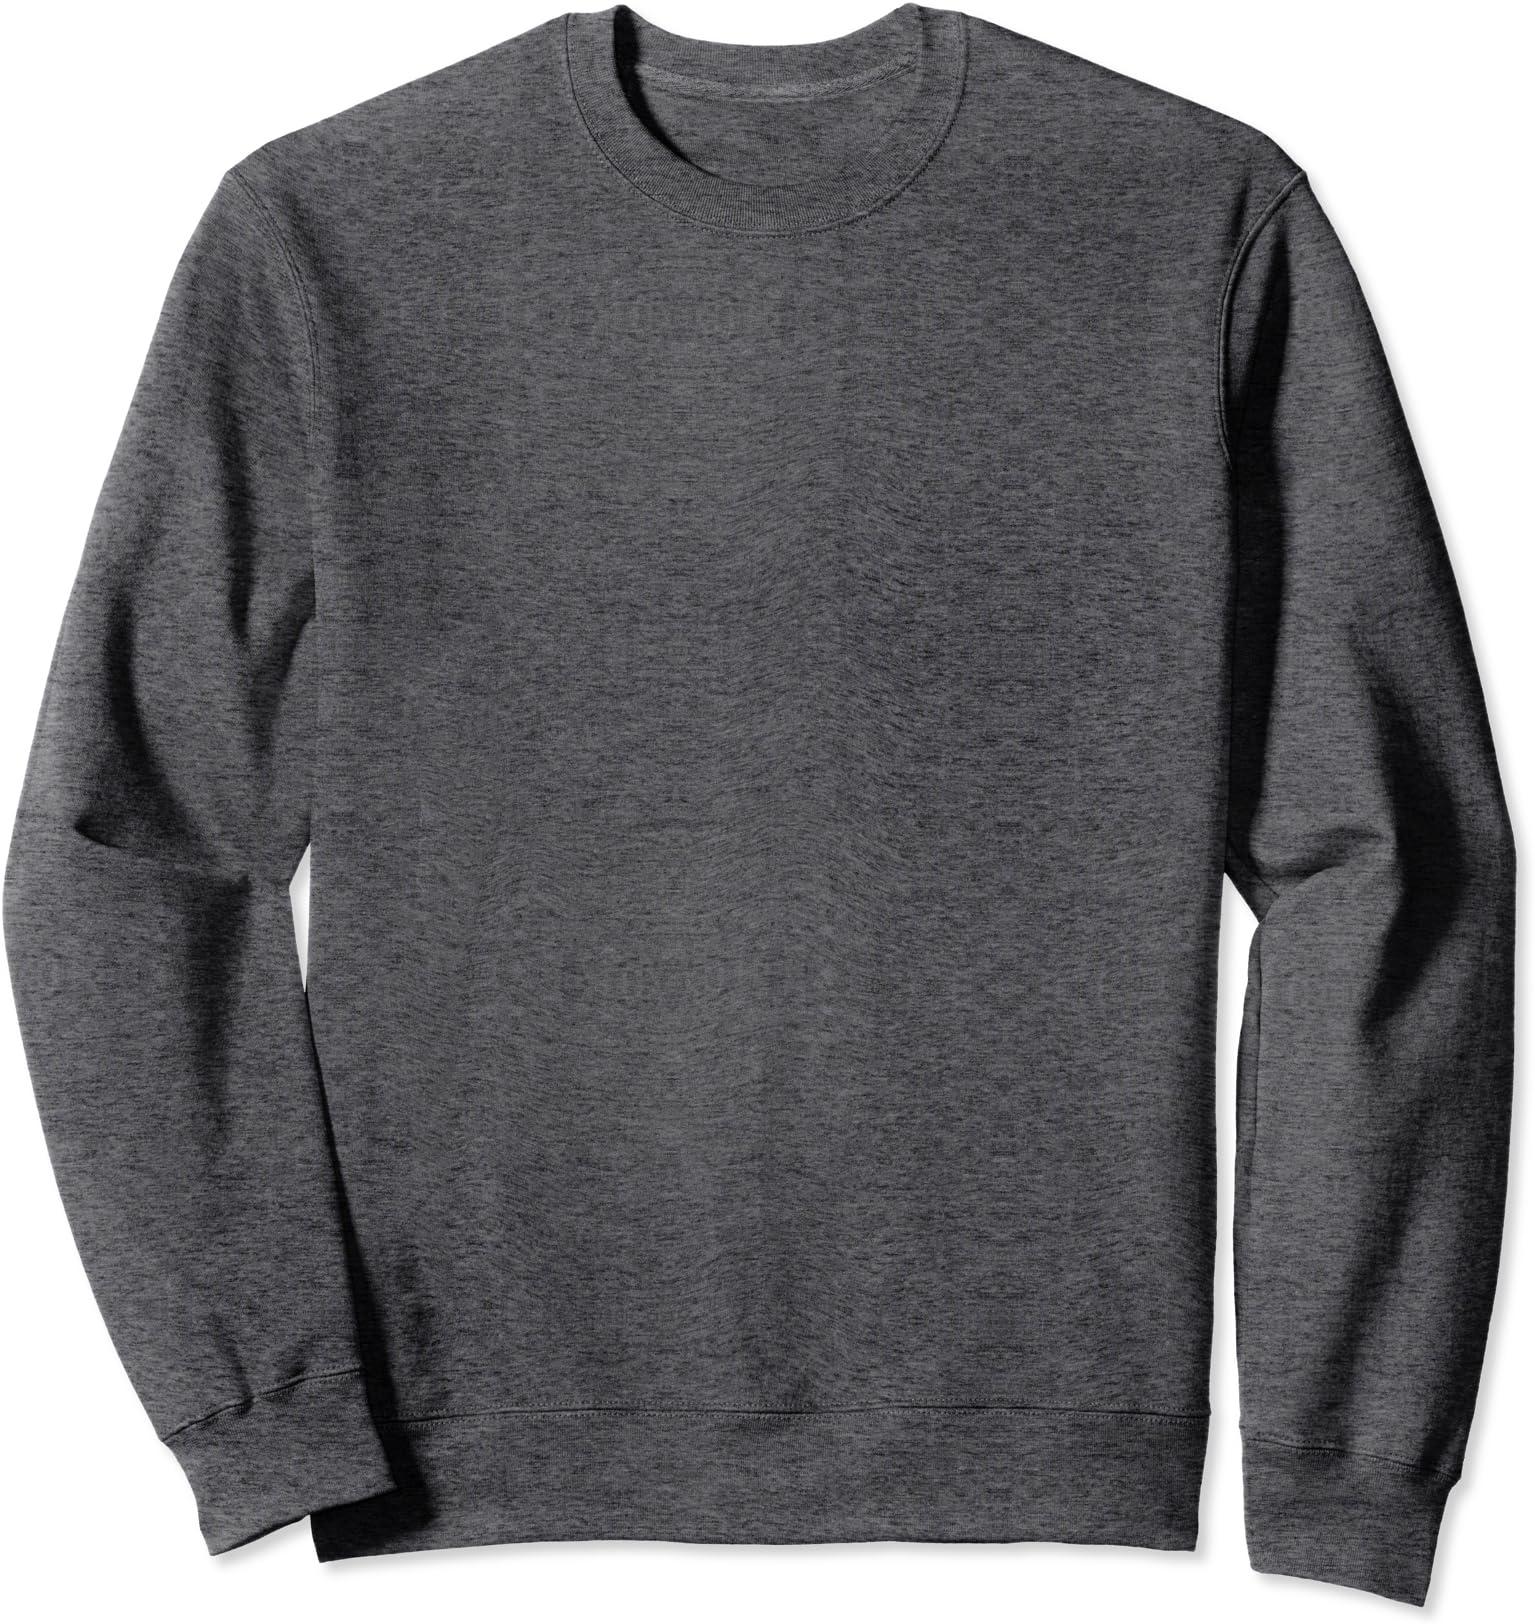 Last Christmas as Miss your surname xmas jumper sweater sweatshirt sleigh design